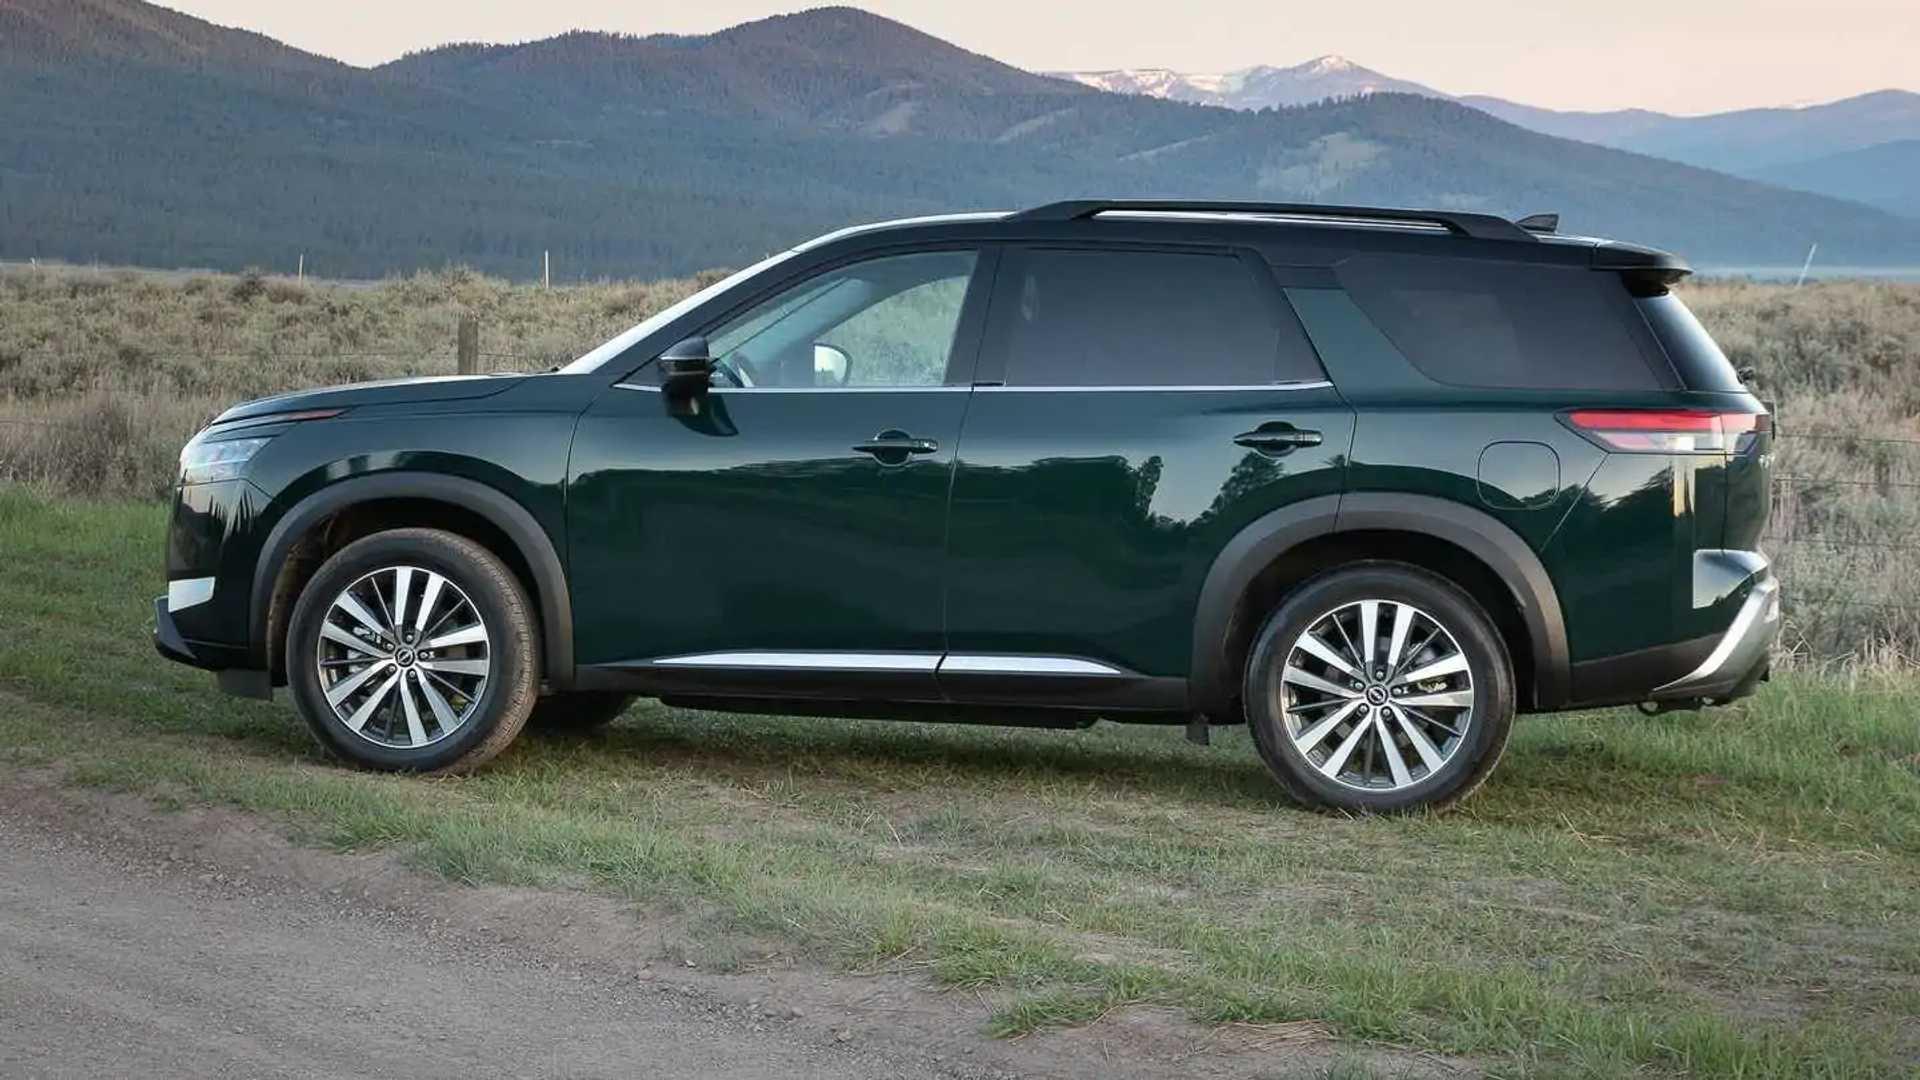 2022 Nissan Pathfinder Platinum Exterior Side Profile